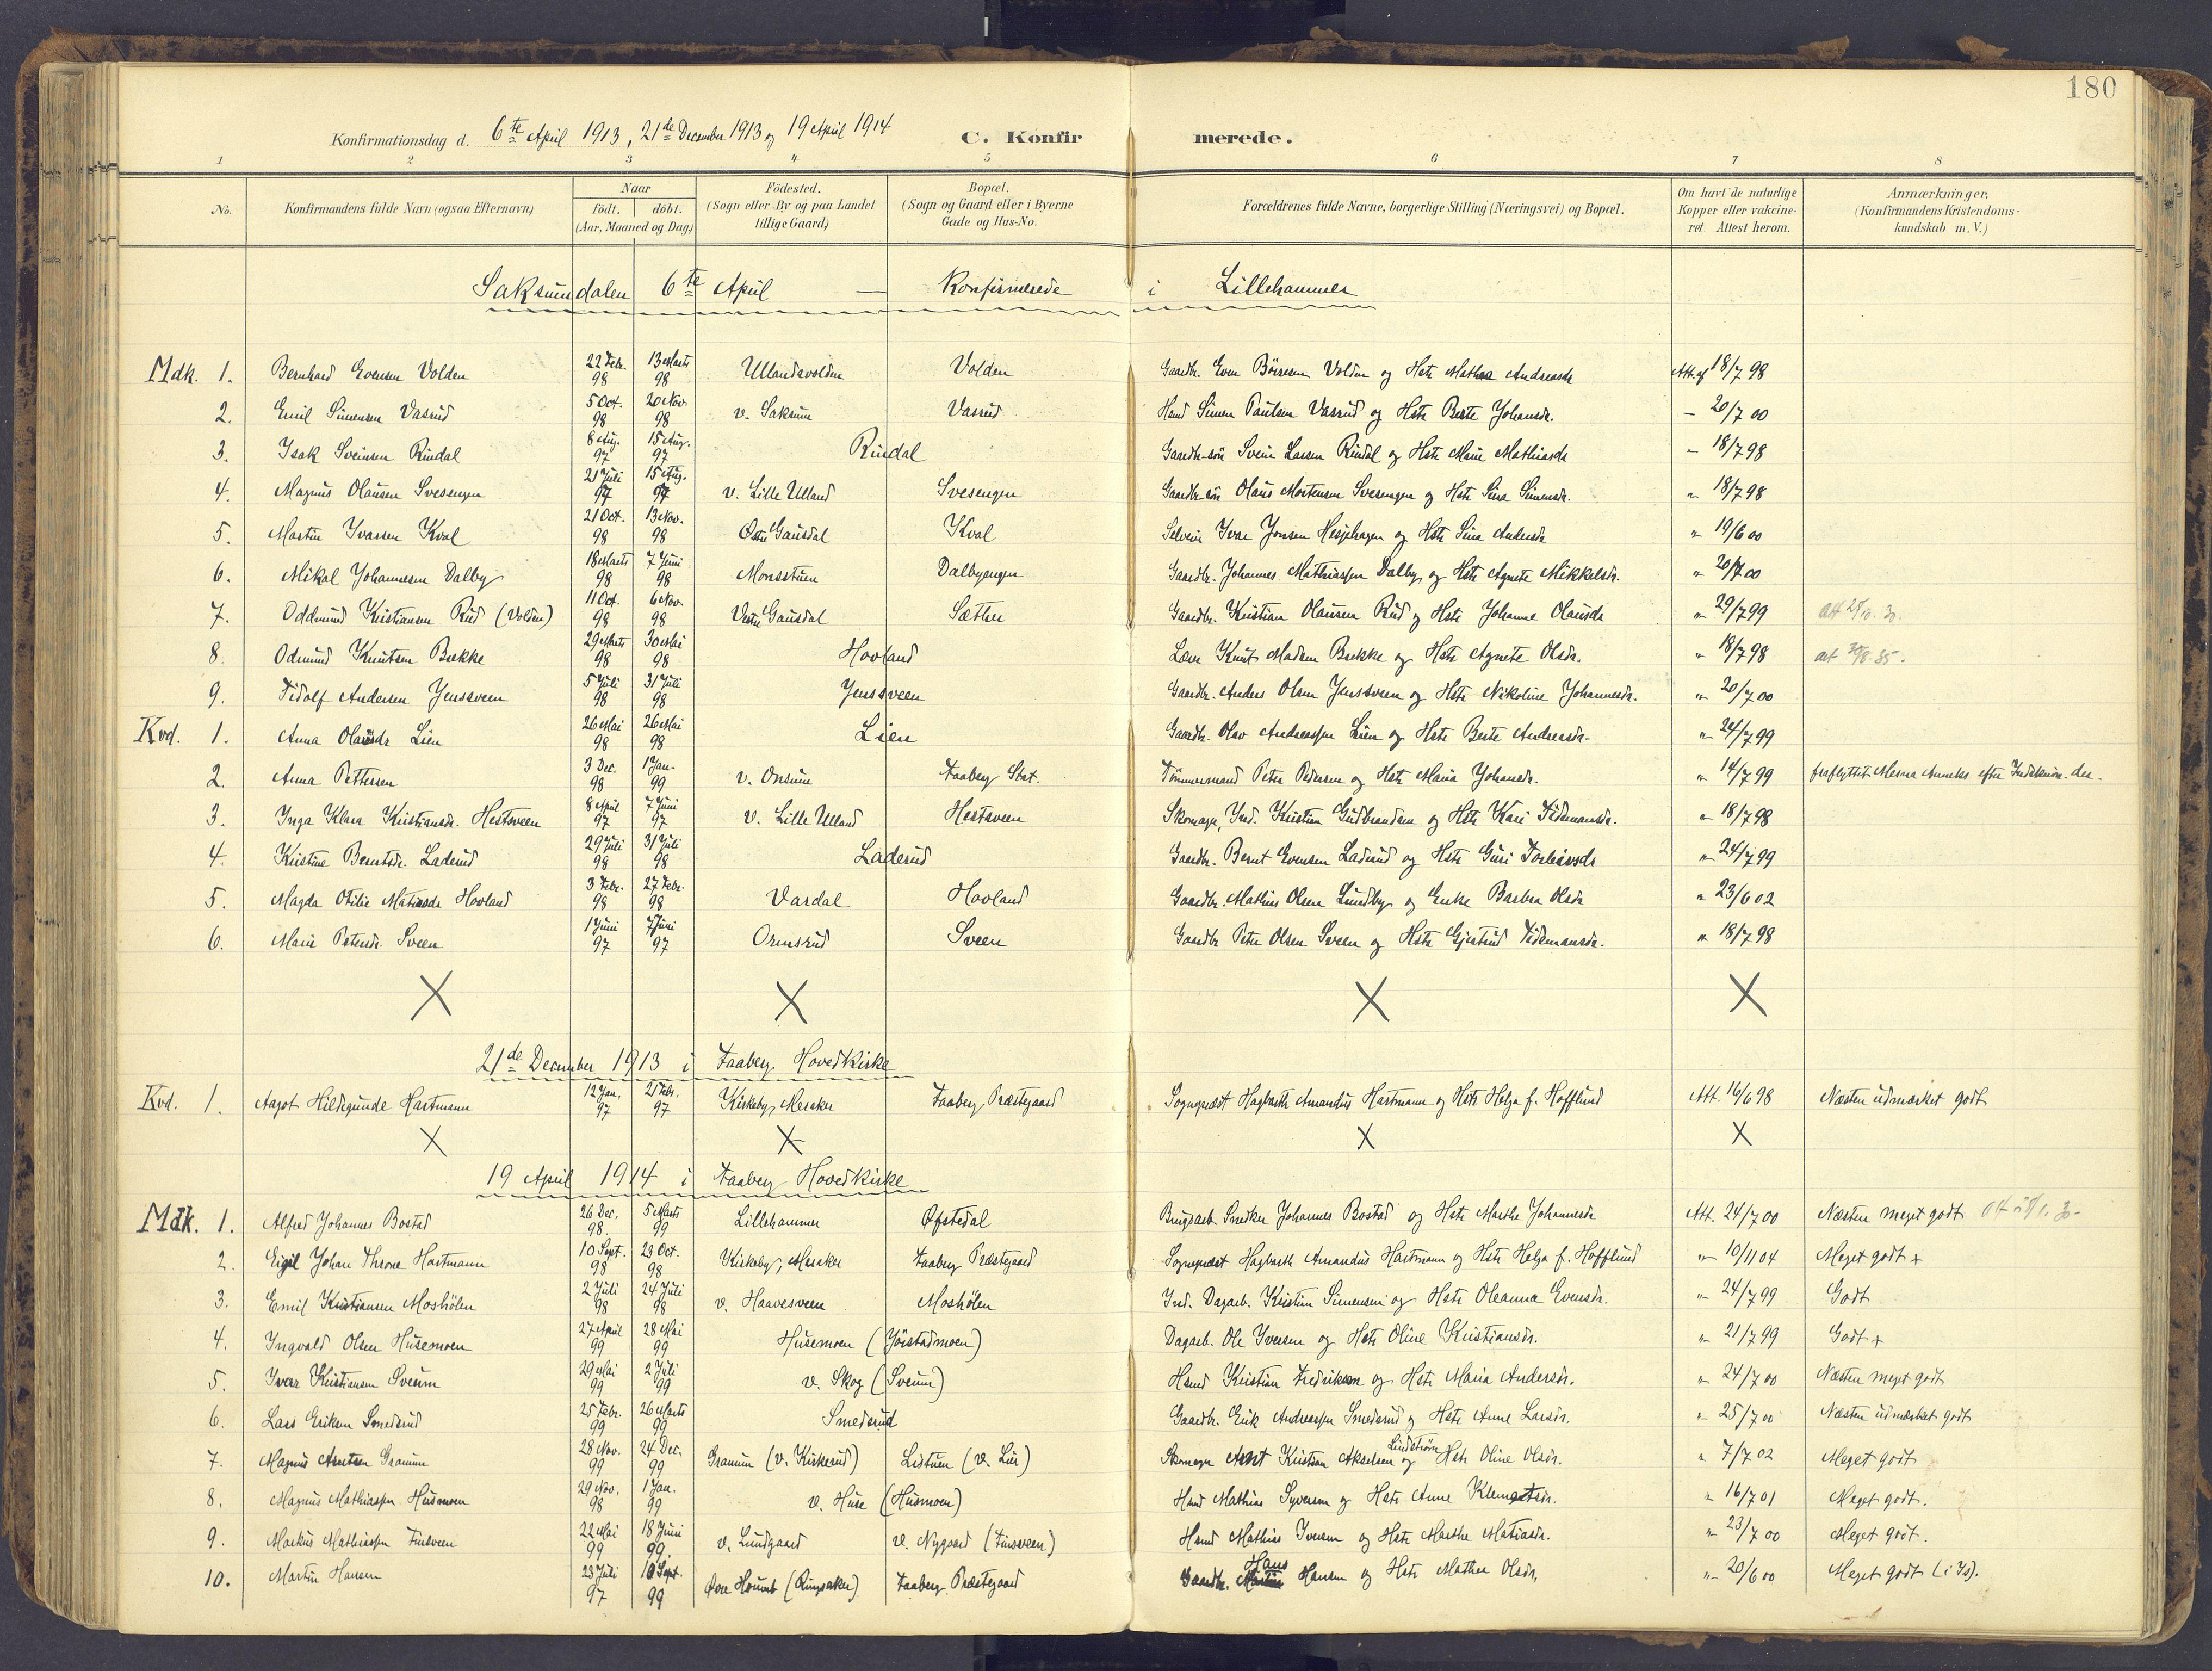 SAH, Fåberg prestekontor, Ministerialbok nr. 12, 1899-1915, s. 180